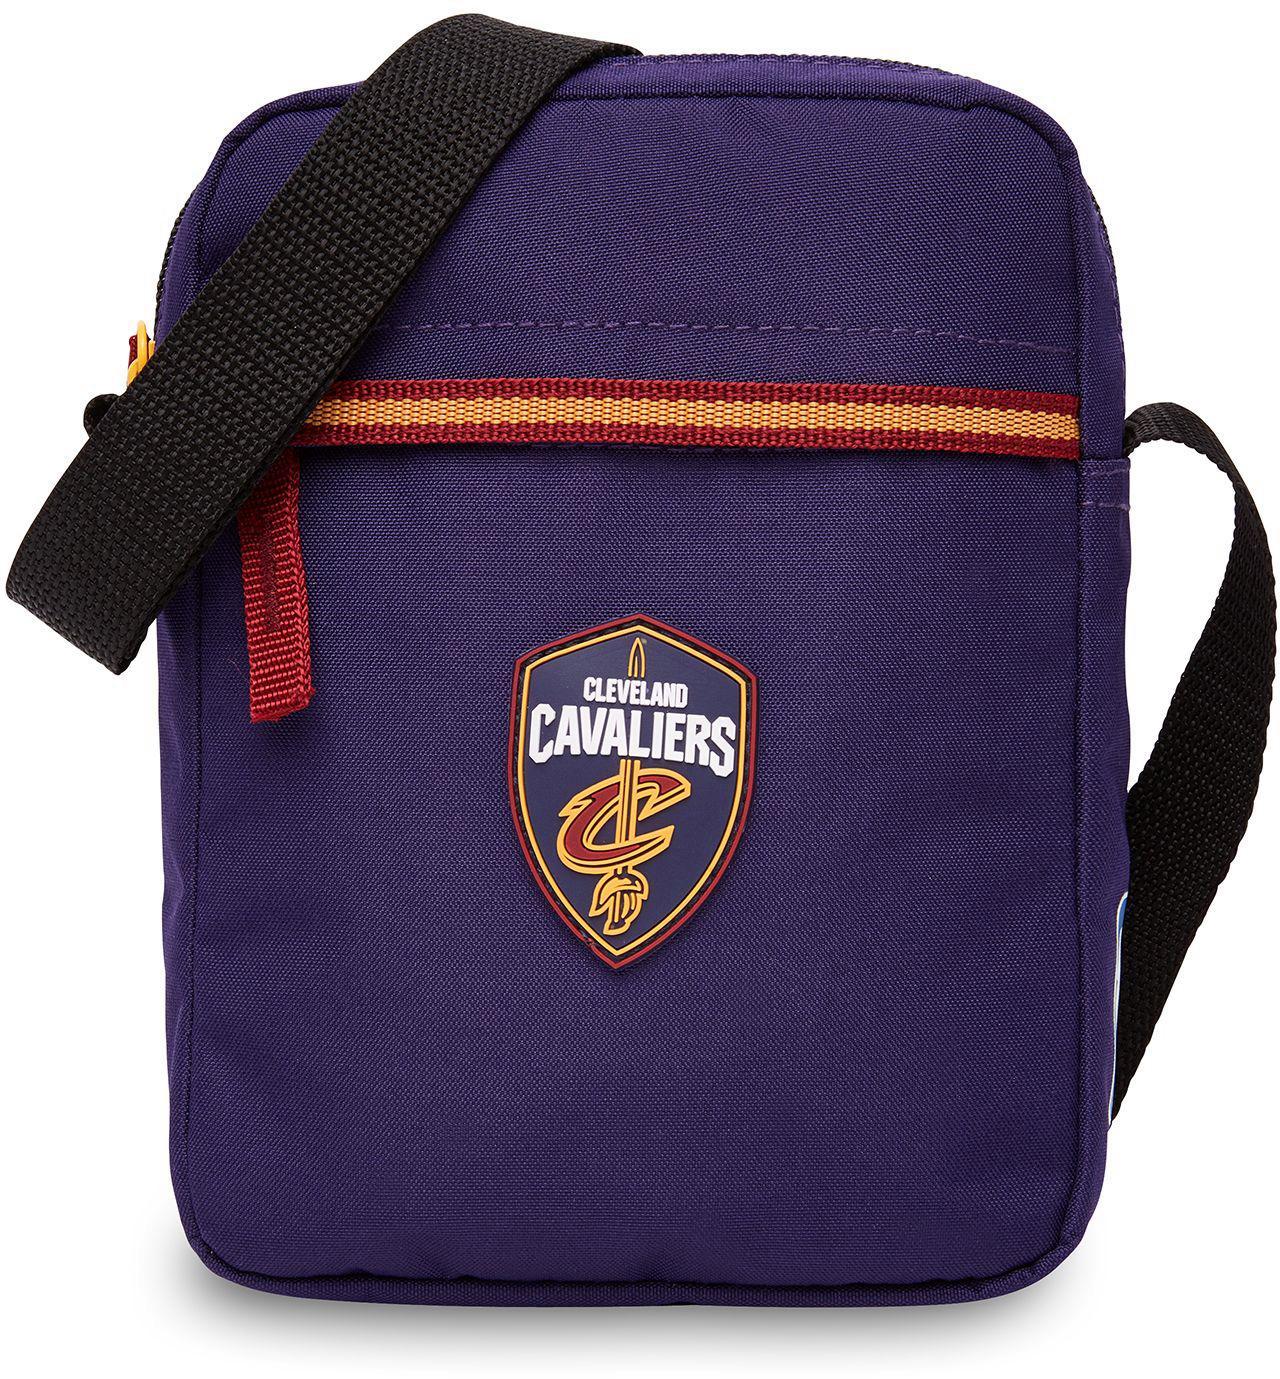 NBA Umhängetasche, »NBA Small Shoulder Bag, Cleveland Cavaliers«   Taschen > Umhängetaschen   Lila   NBA